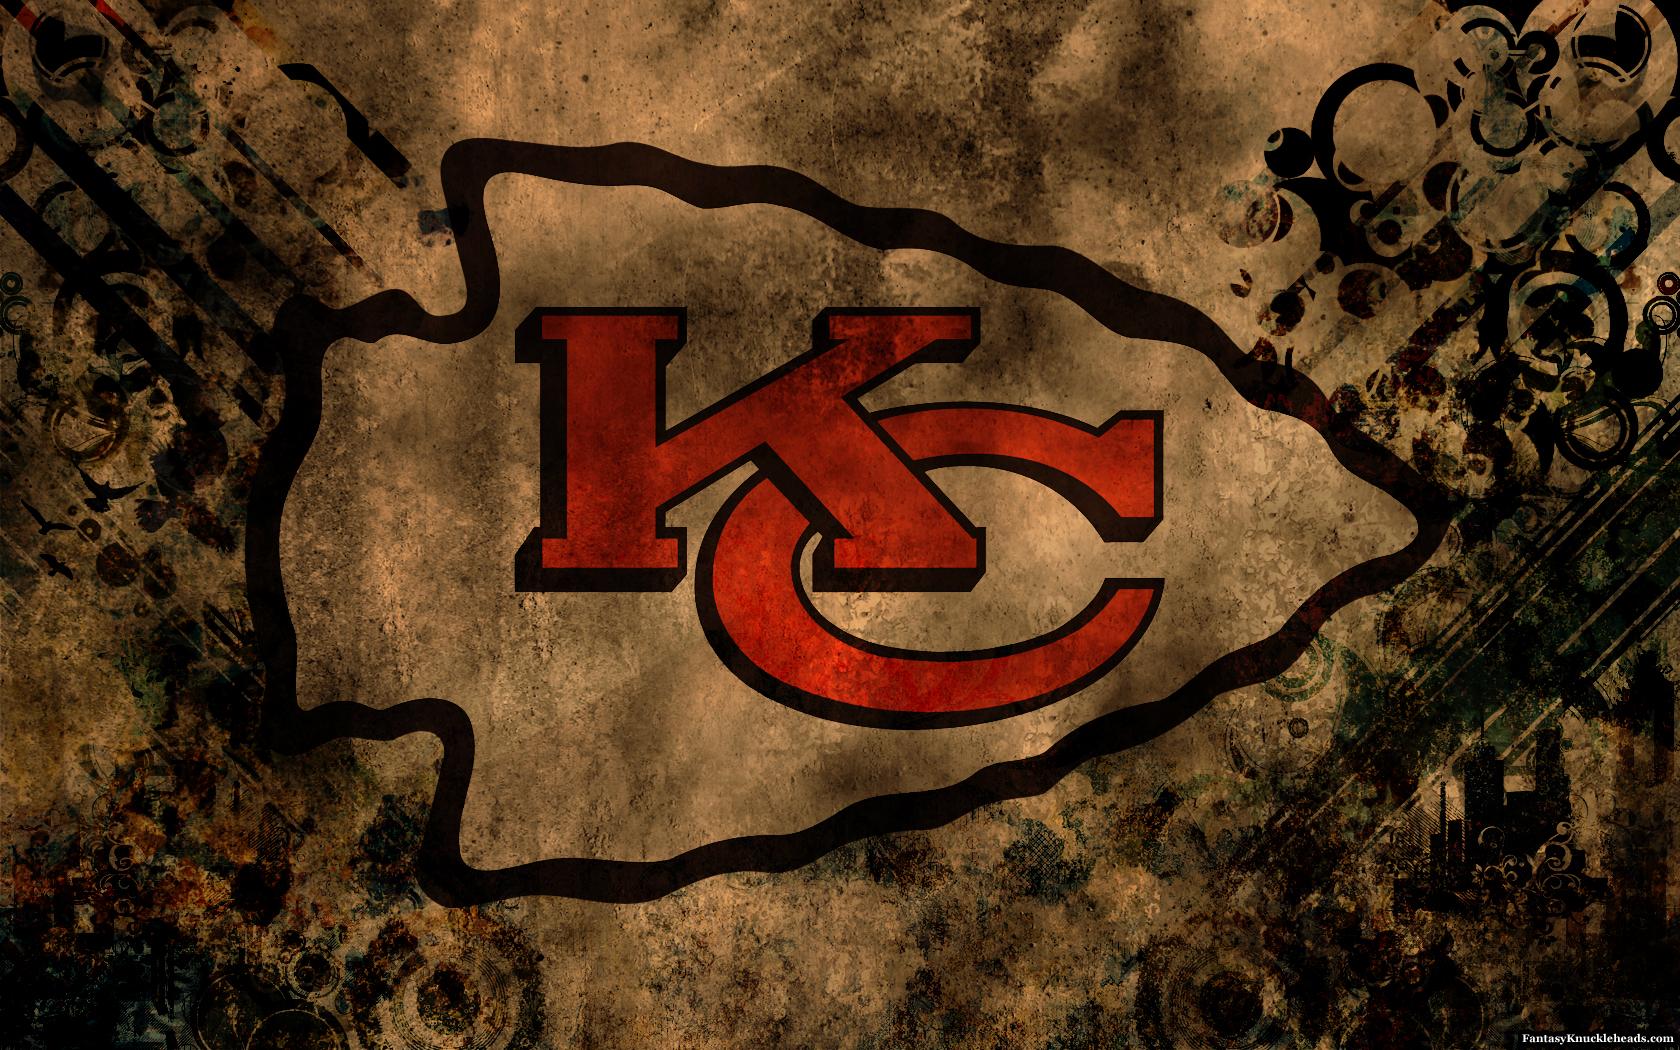 49 Kc Chiefs Wallpaper And Screensavers On Wallpapersafari